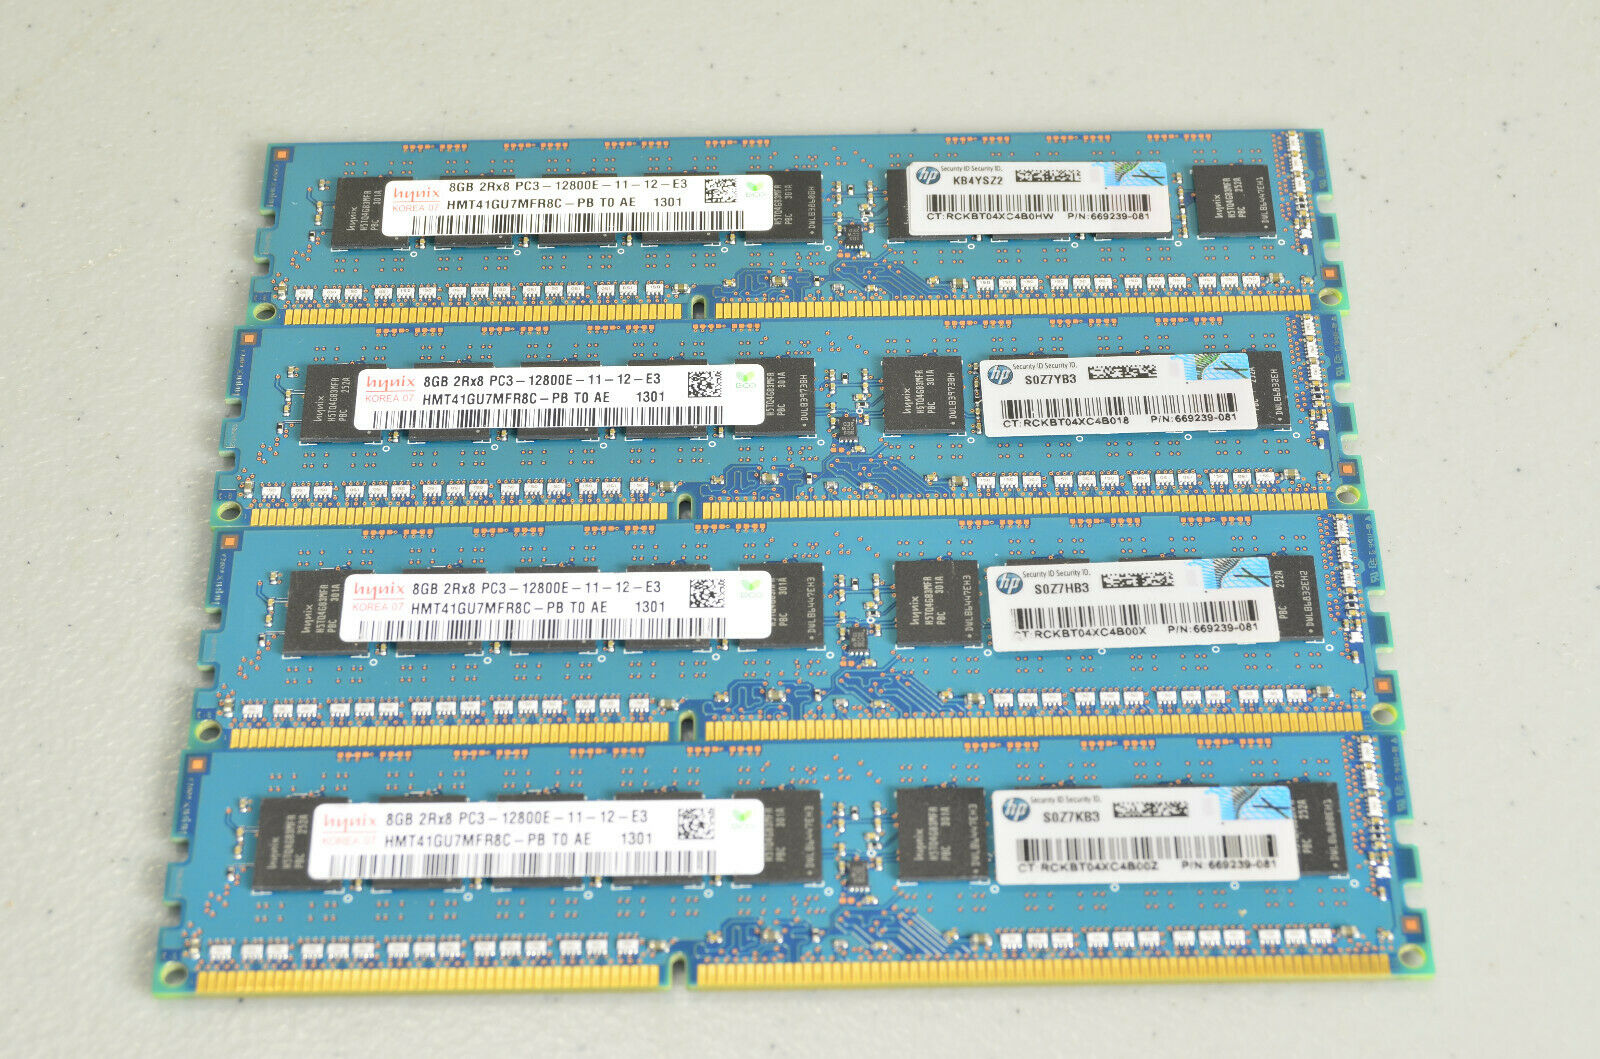 HP 32GB (8GB x4) DDR3-1600 PC3-12800E 240-Pin ECC Memory Modules 669239-081. Buy it now for 95.00